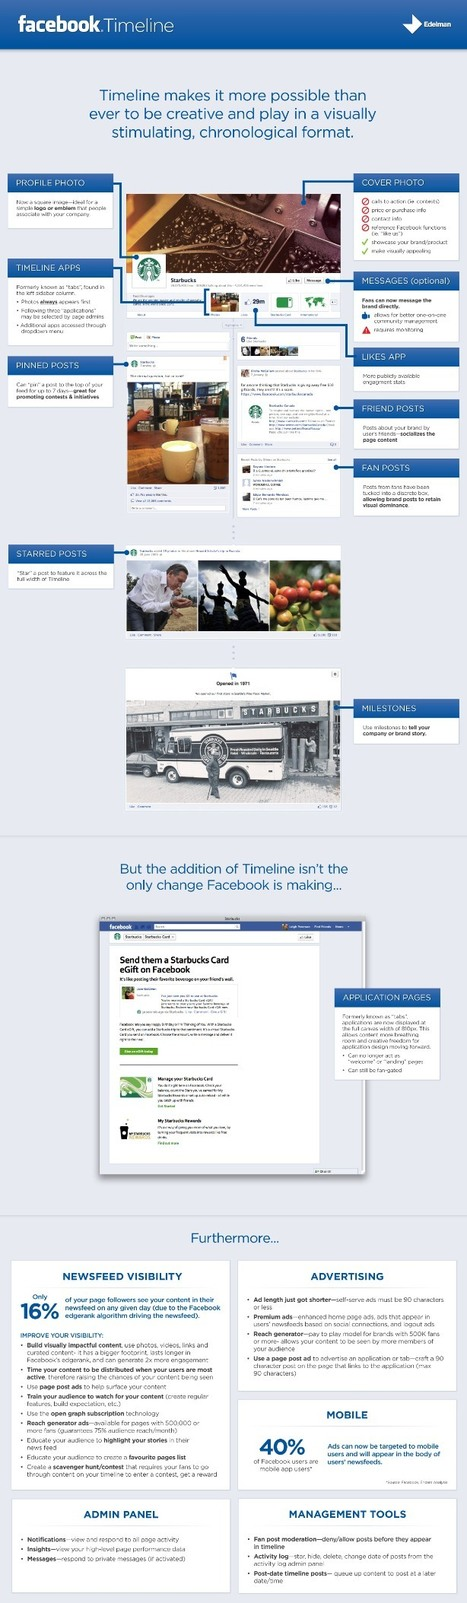 Facebook Timeline Overview Infographic   Edelman Digital   Being Social Us   Scoop.it